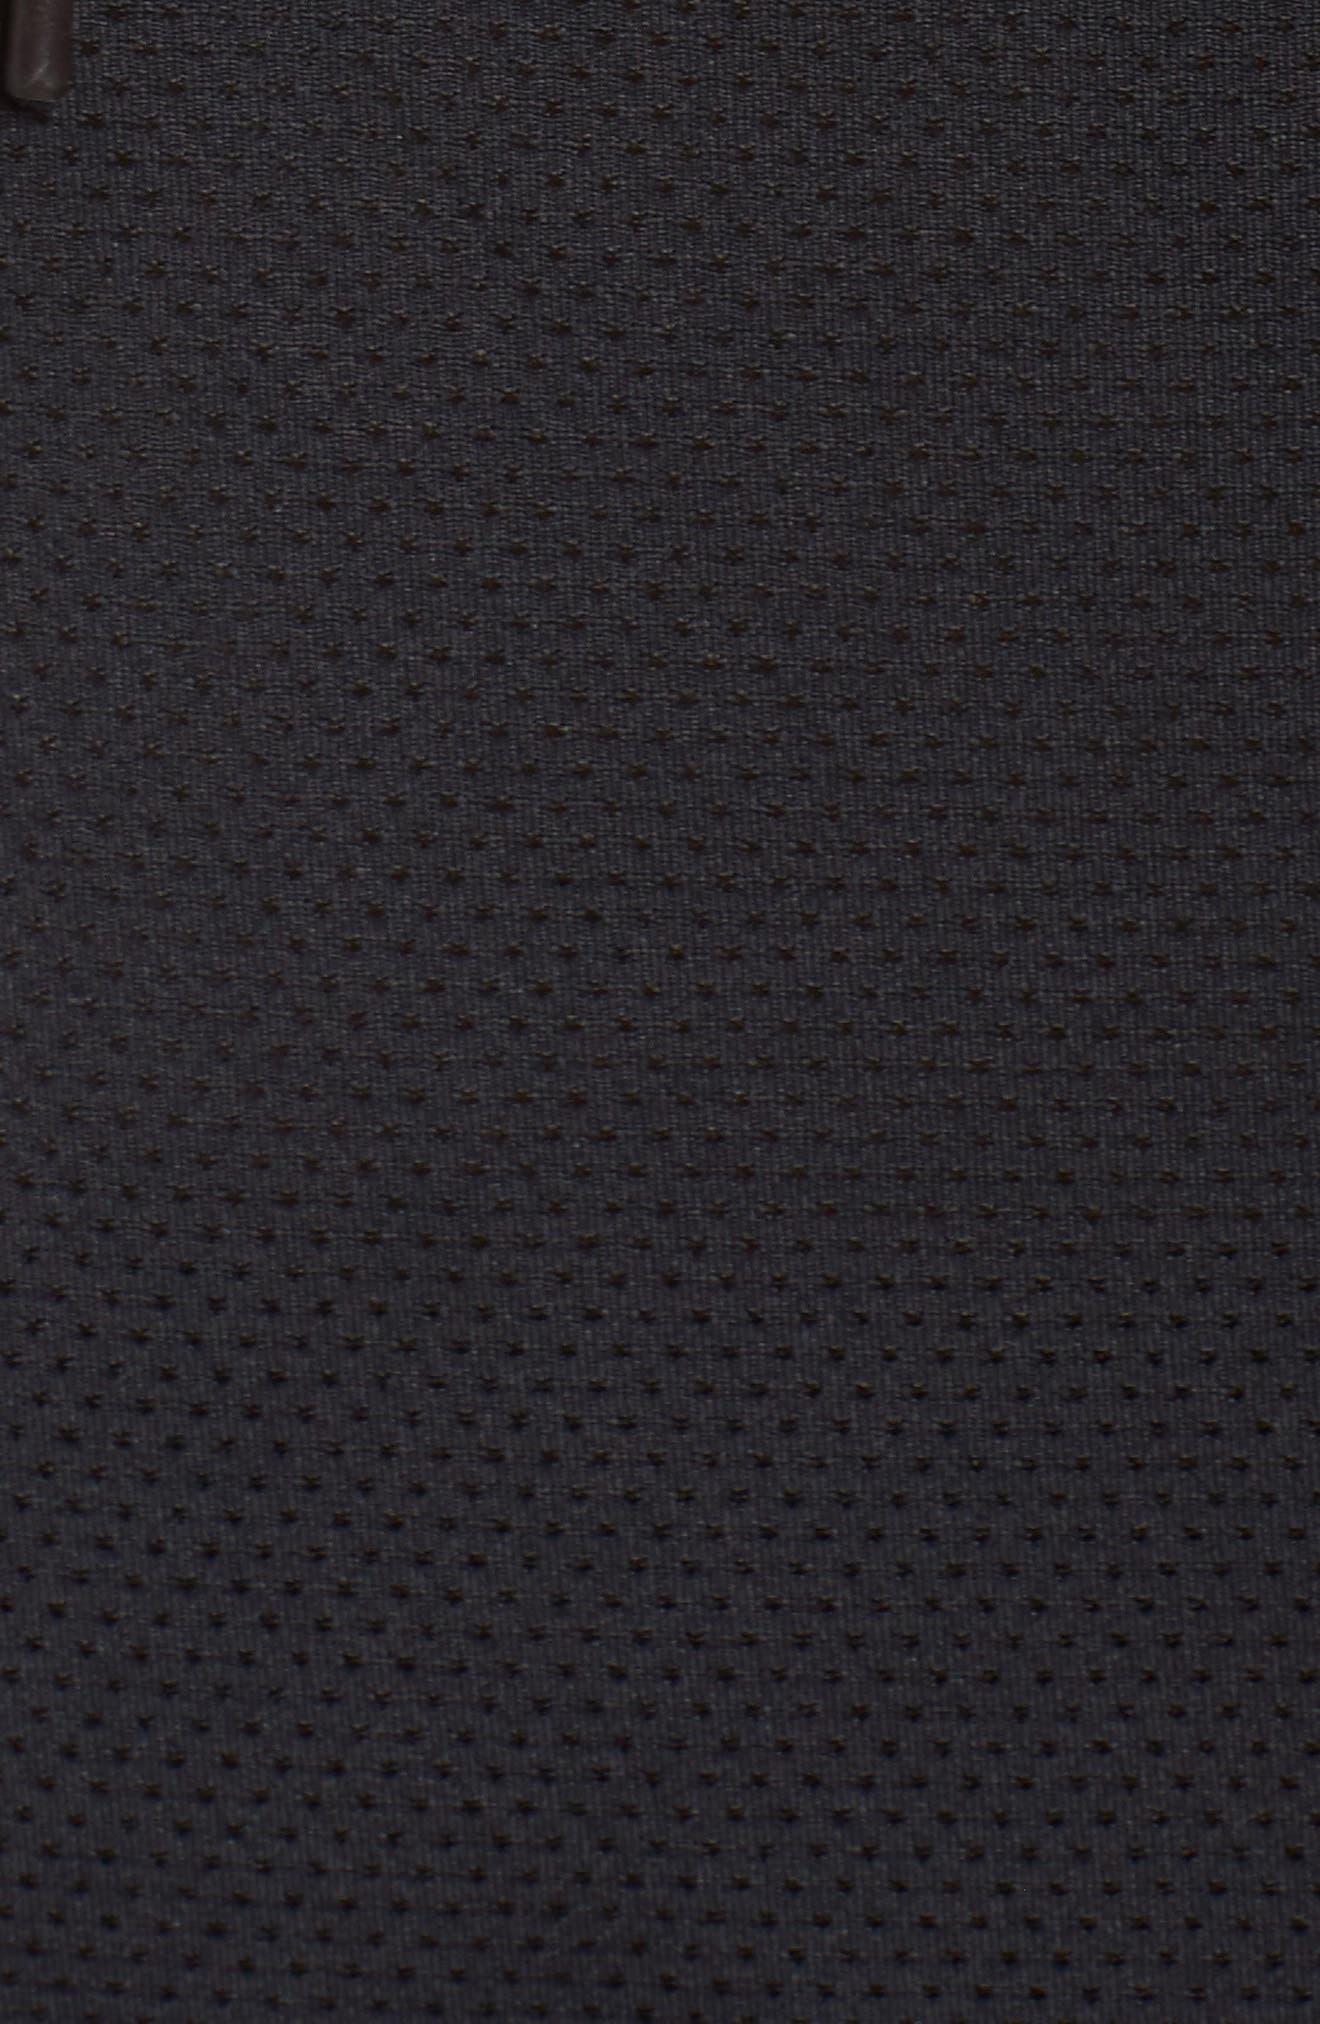 Endurance Hoodie Vest,                             Alternate thumbnail 6, color,                             Black